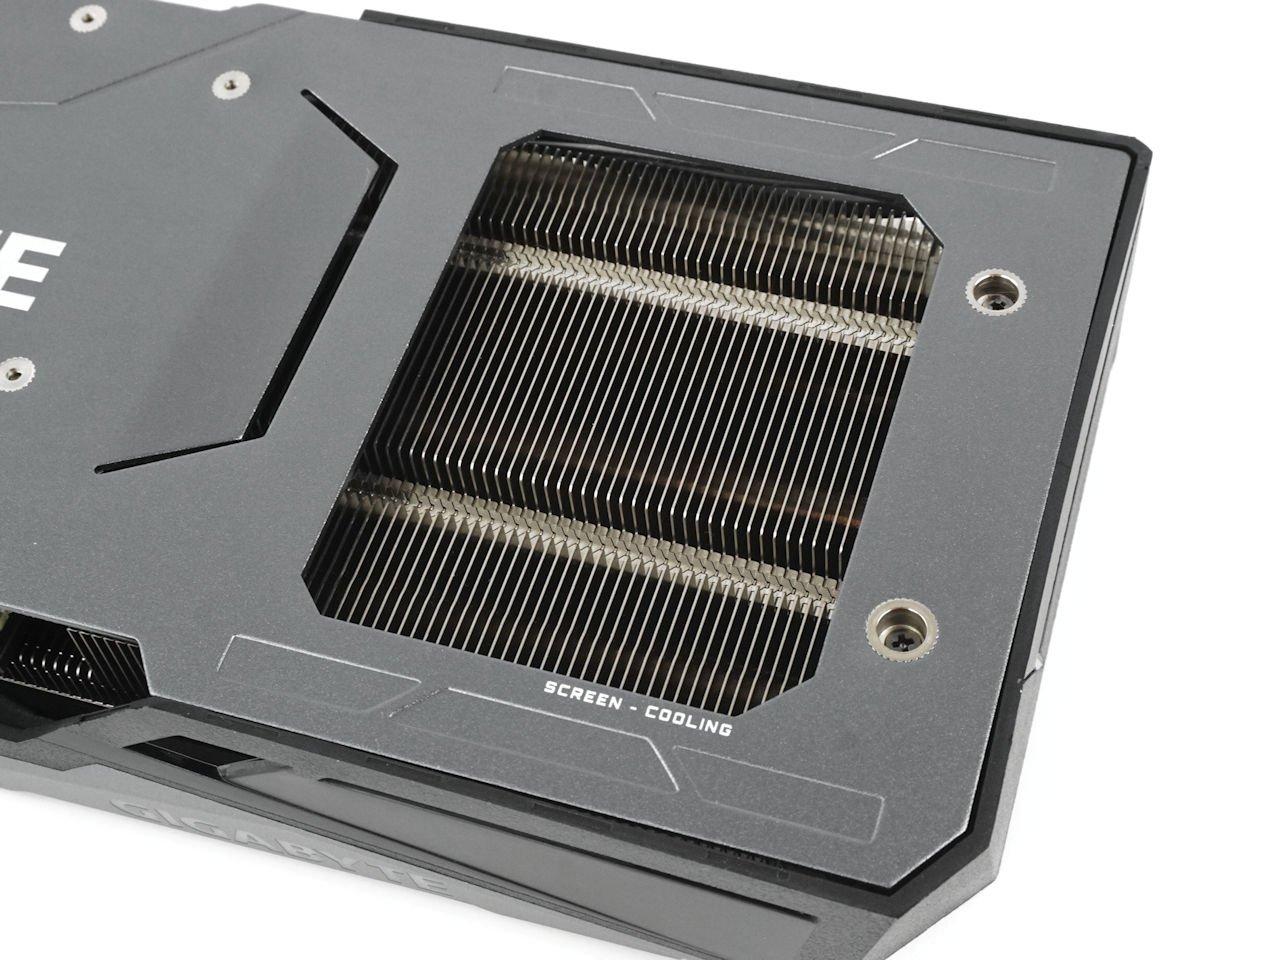 GIGABYTE RTX 3060 GAMING OC 顯示卡